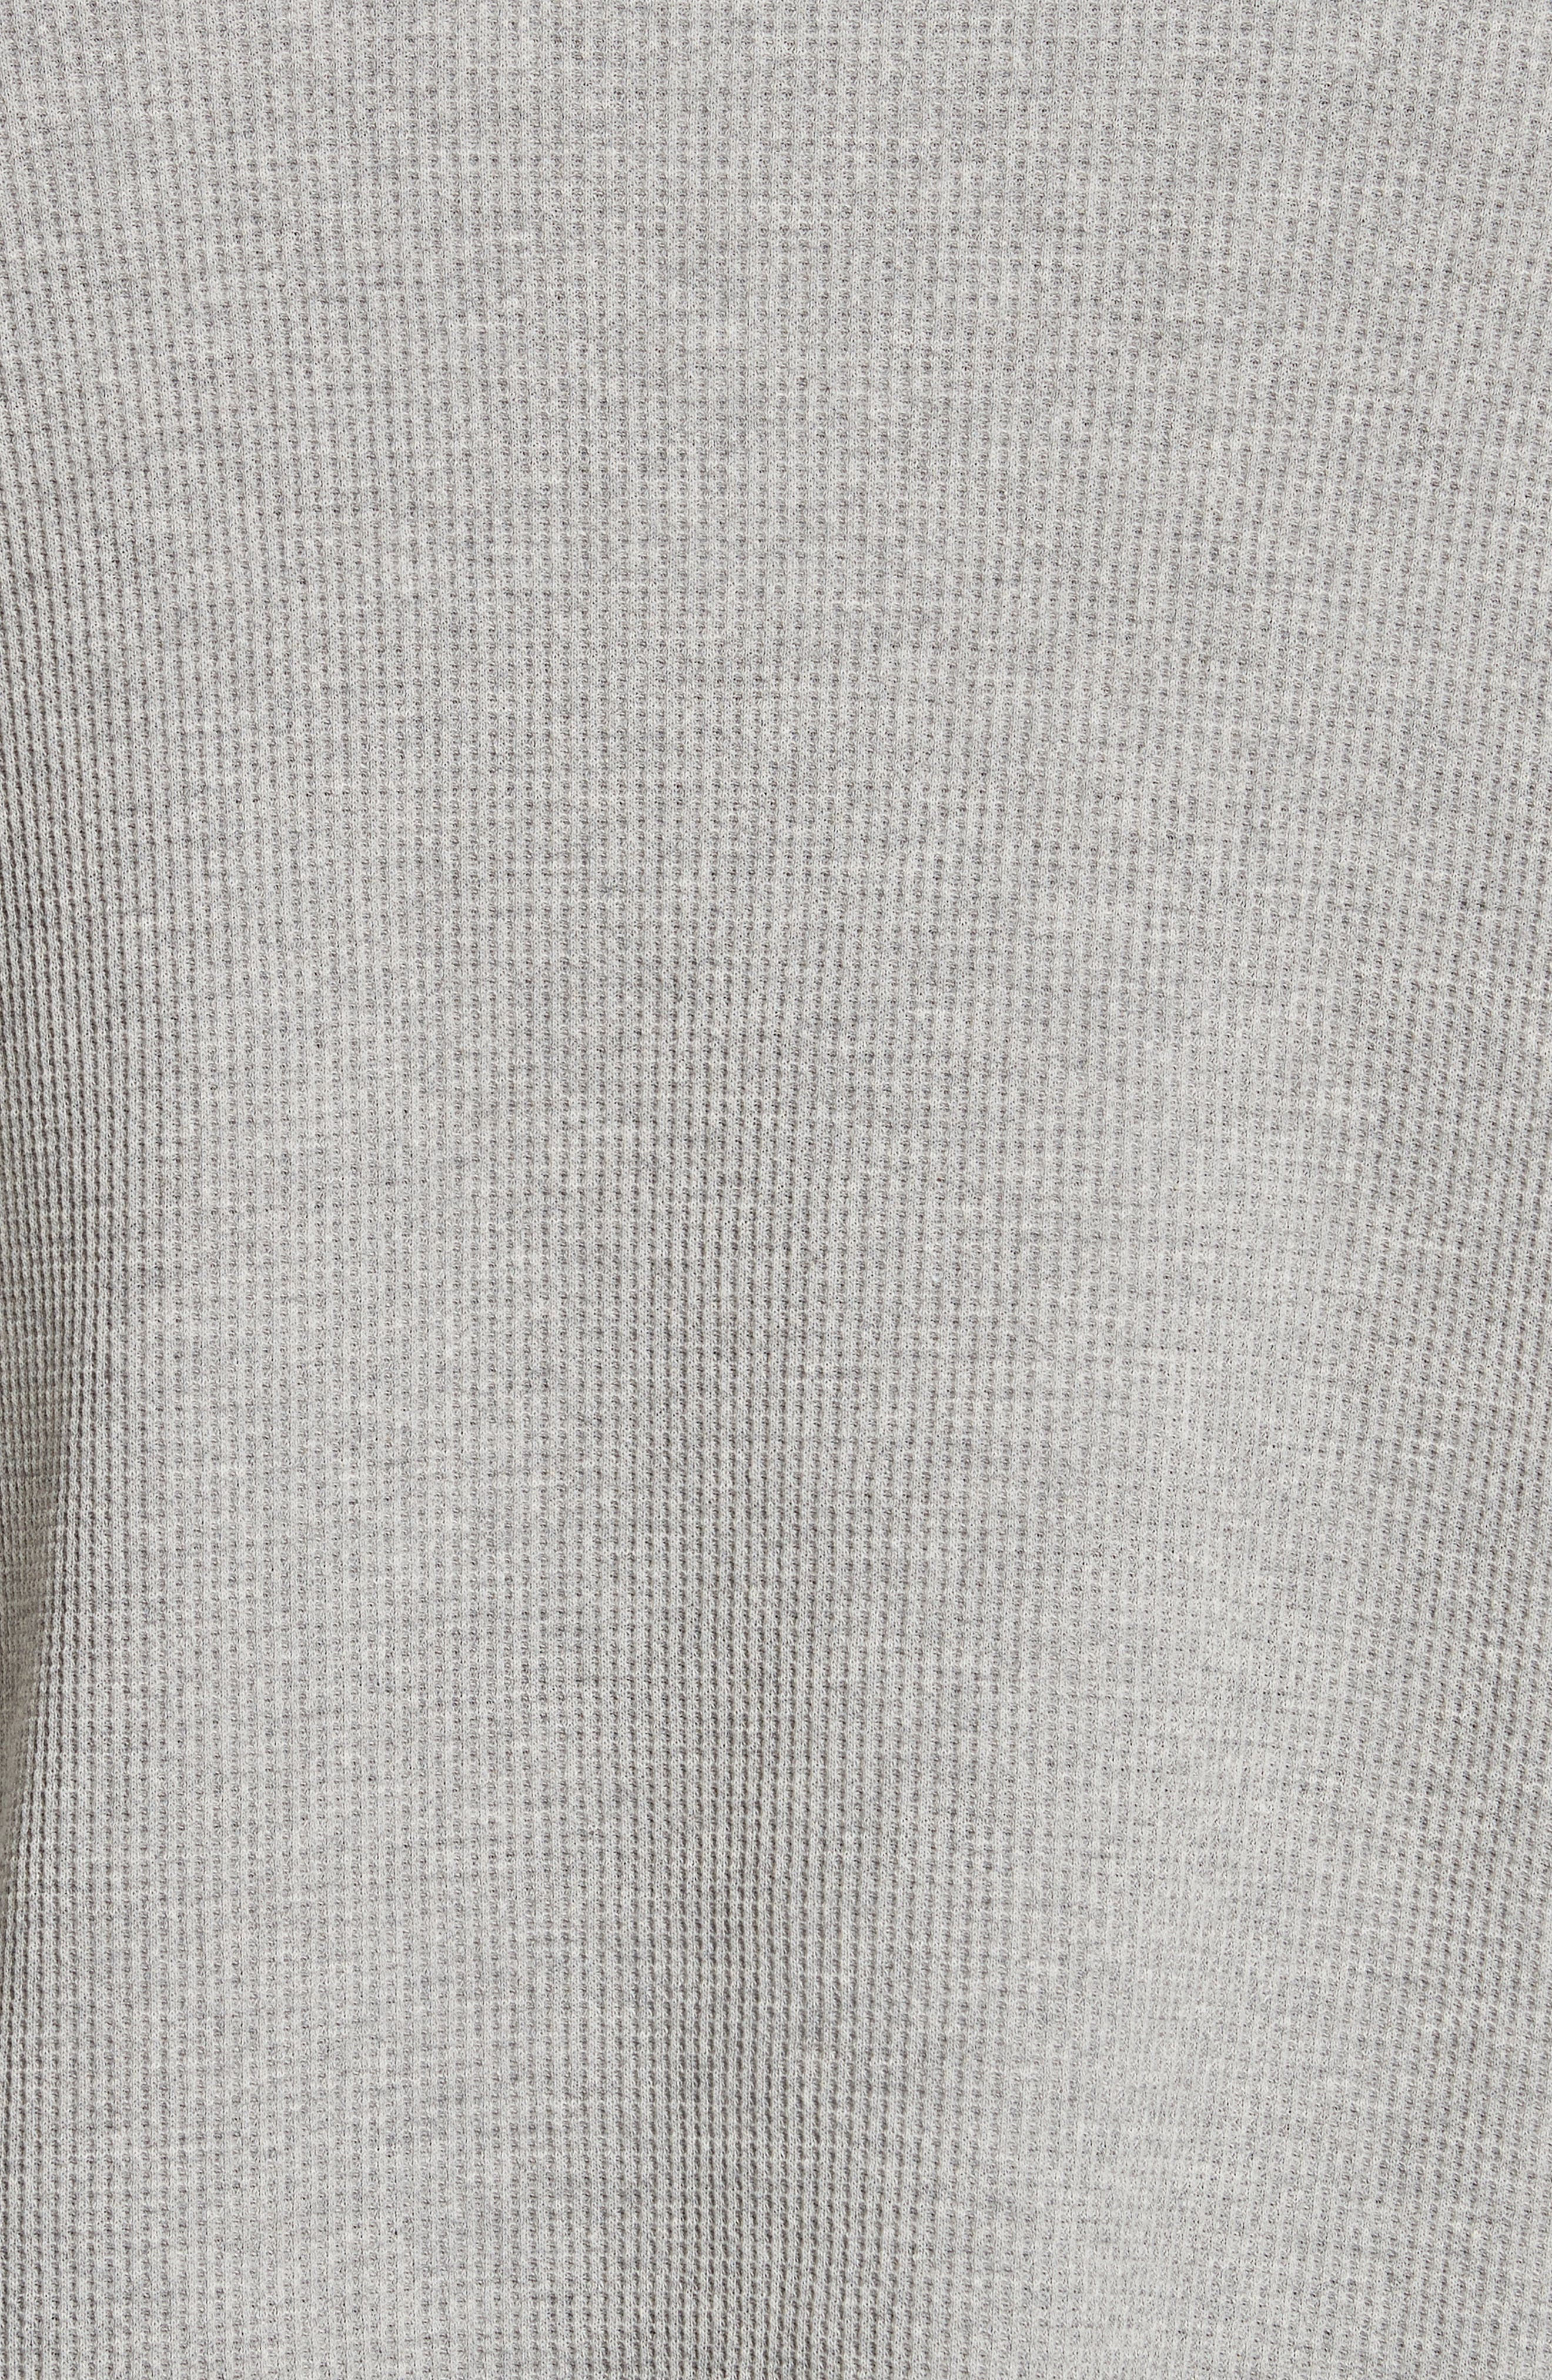 Military Panel Sleeve Thermal Shirt,                             Alternate thumbnail 5, color,                             029